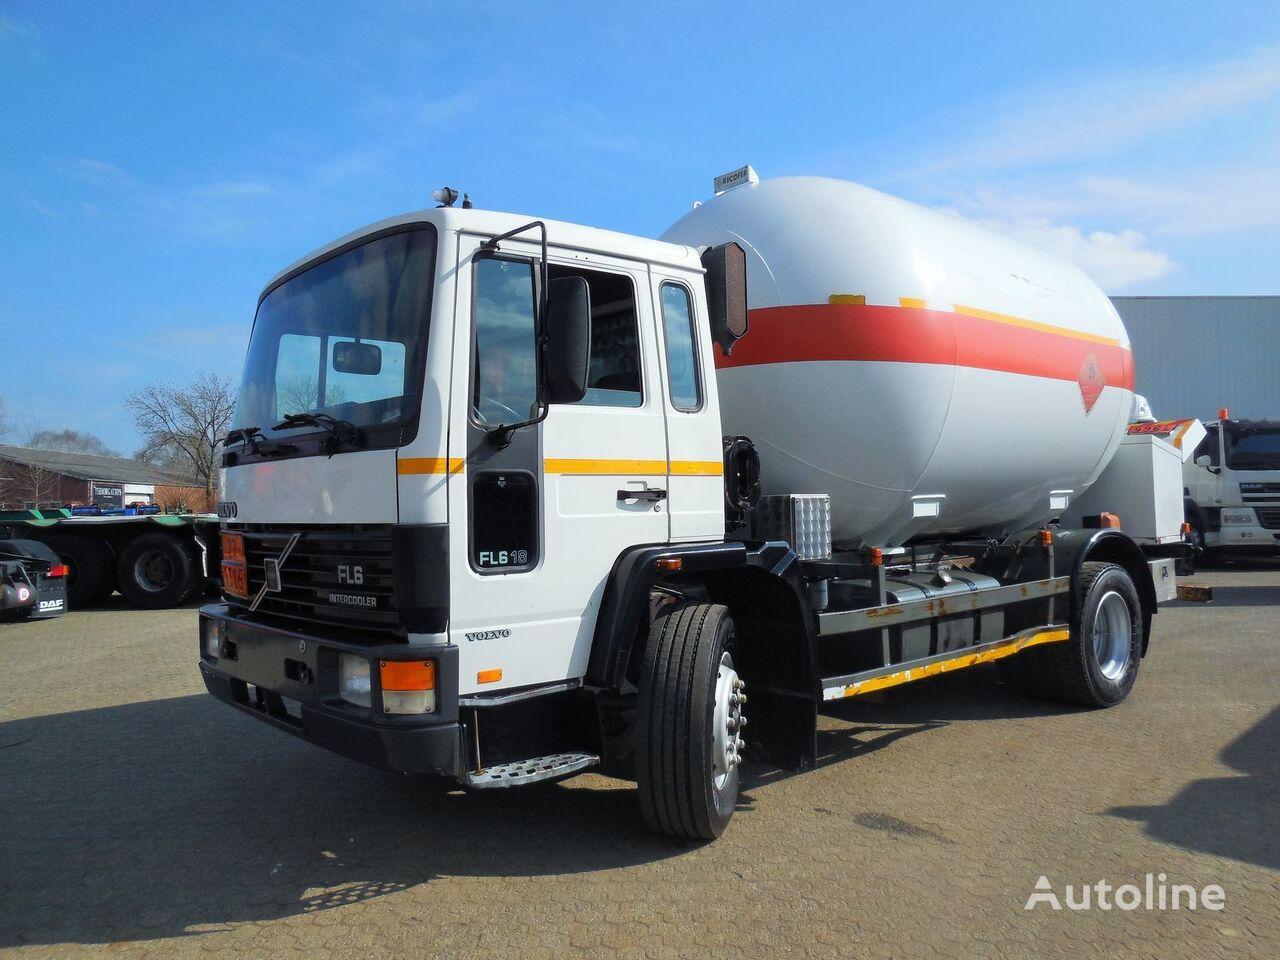 VOLVO Volvo GAS 17.000 - FL618 - P27BH - GPL Gastransporter LKW